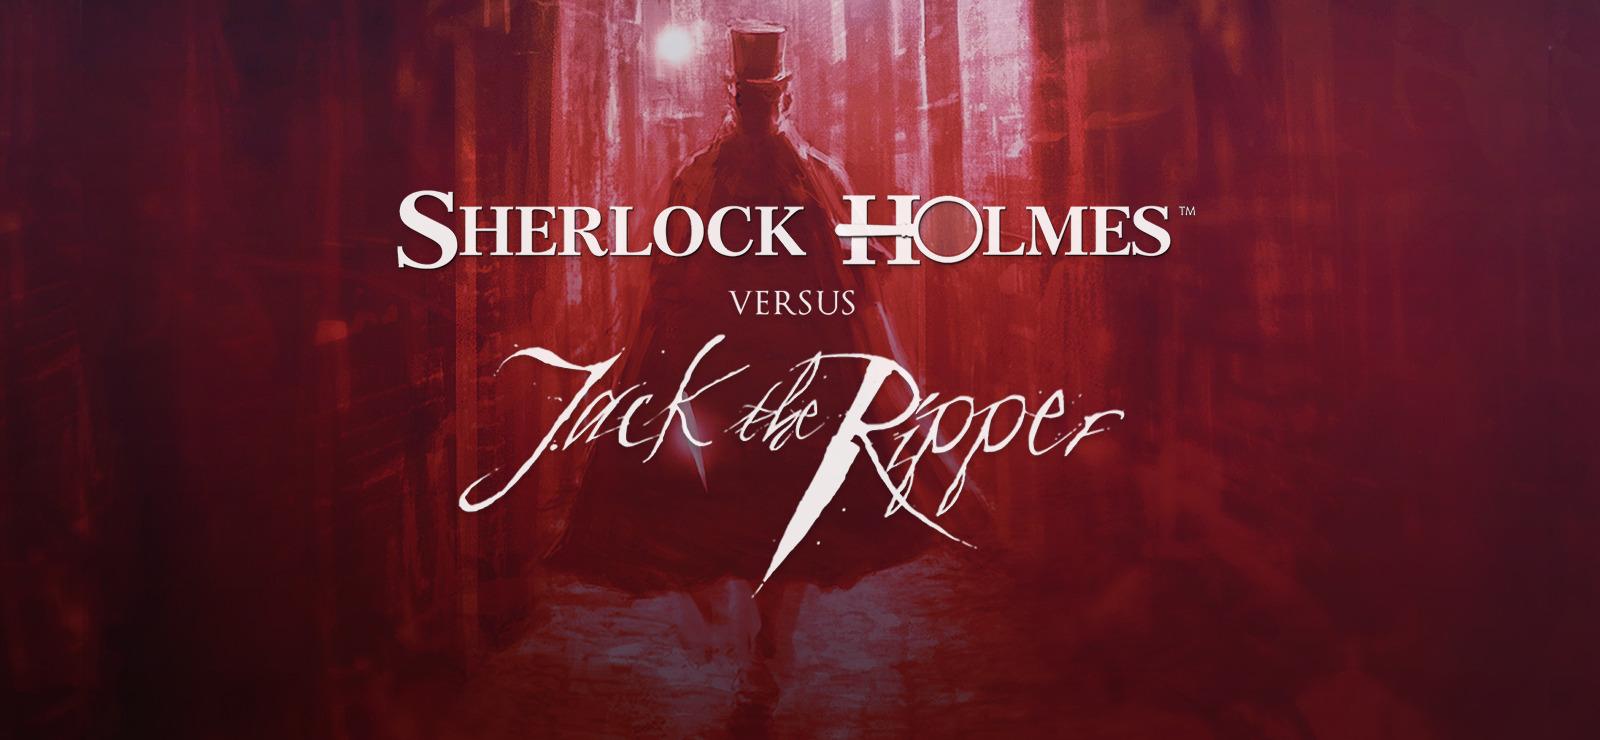 sherlock holmes vs jack the ripper pc download